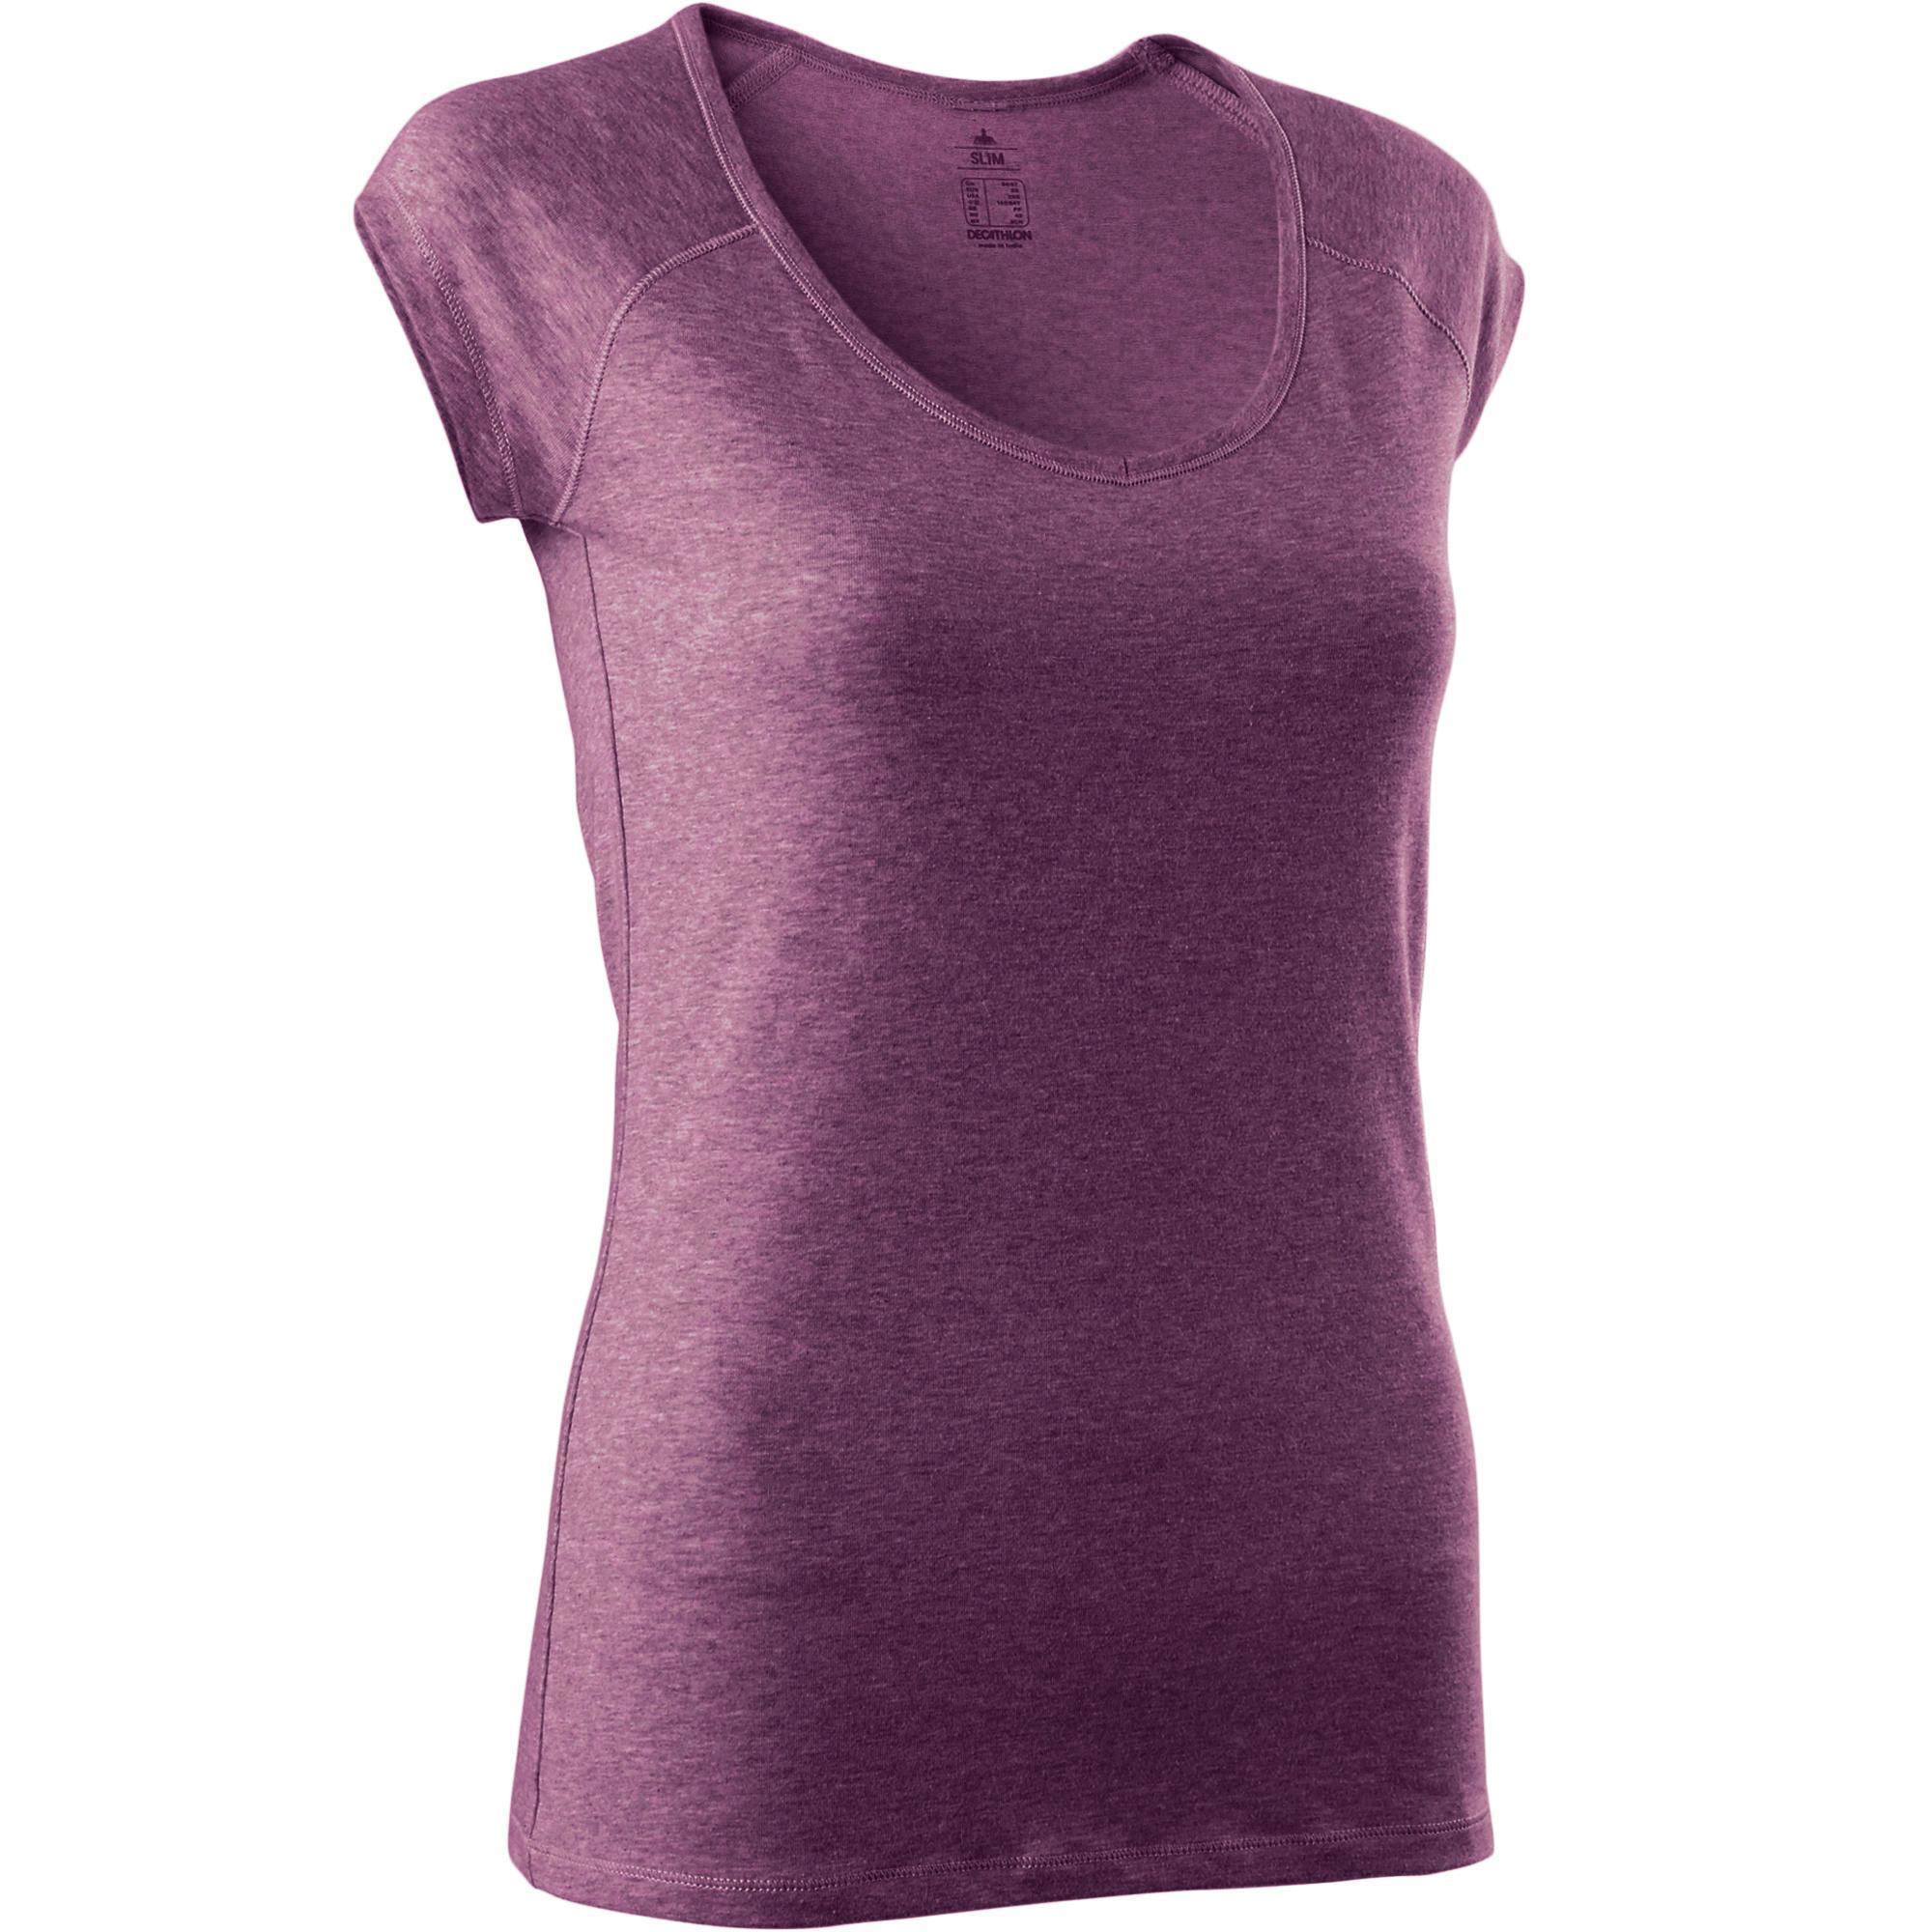 8870070ad86e2 Azul Slim 500 Gimnasia Stretching Mujer Domyos Camiseta Oscuro gBXTxwzgq